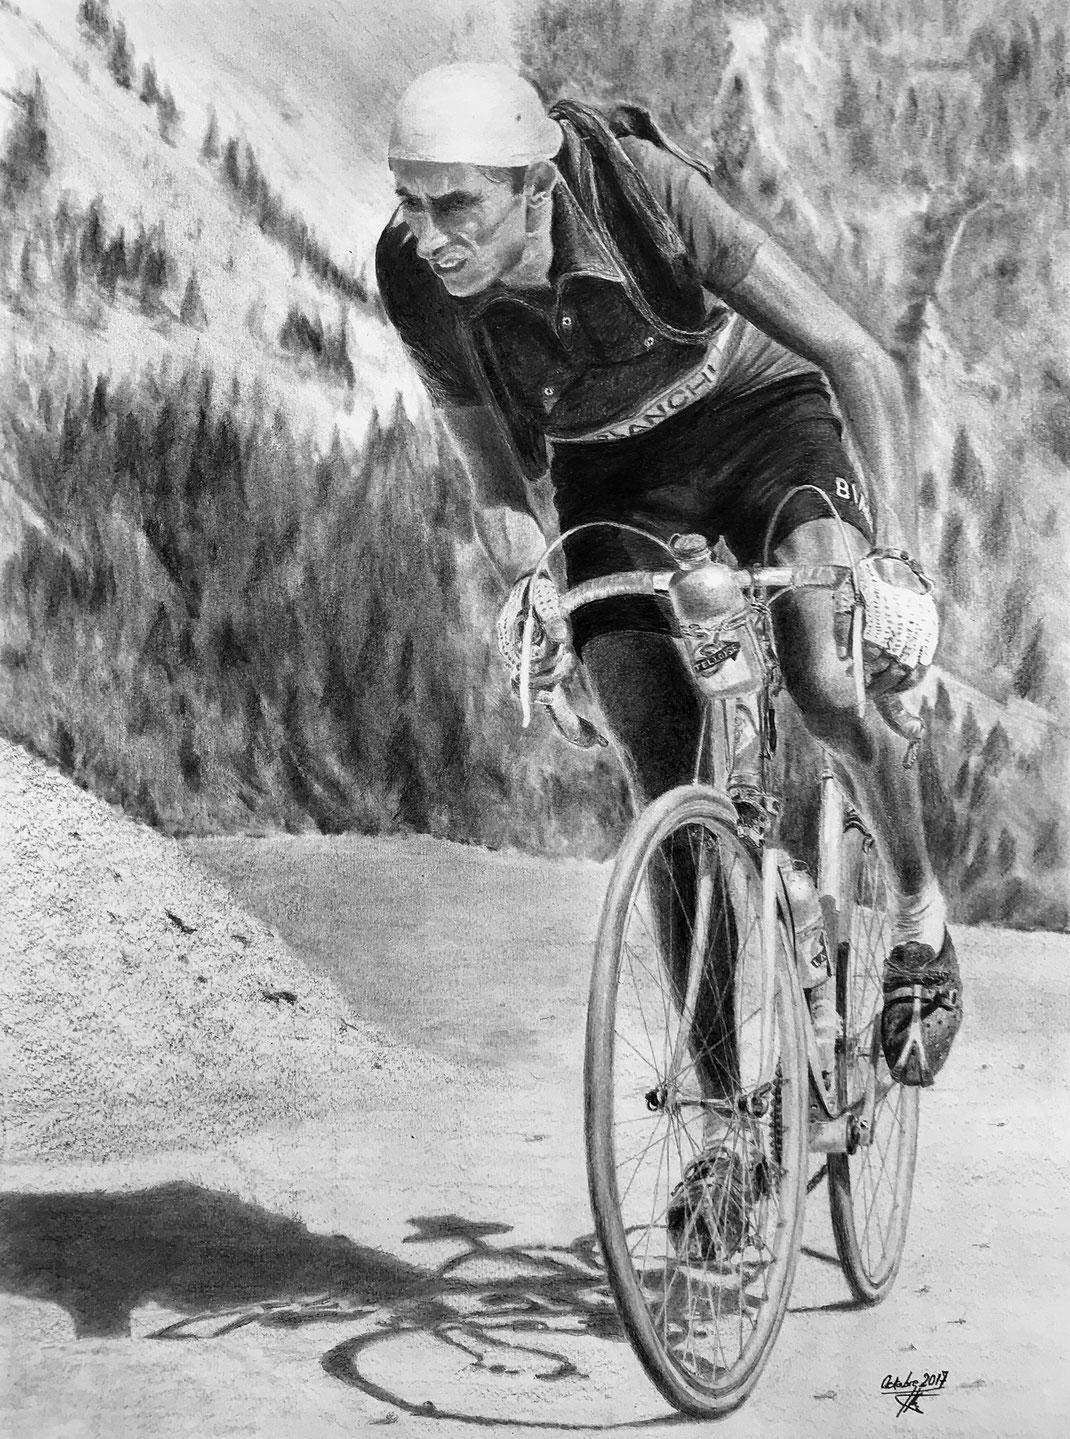 Fausto Coppi dans l'Izoard